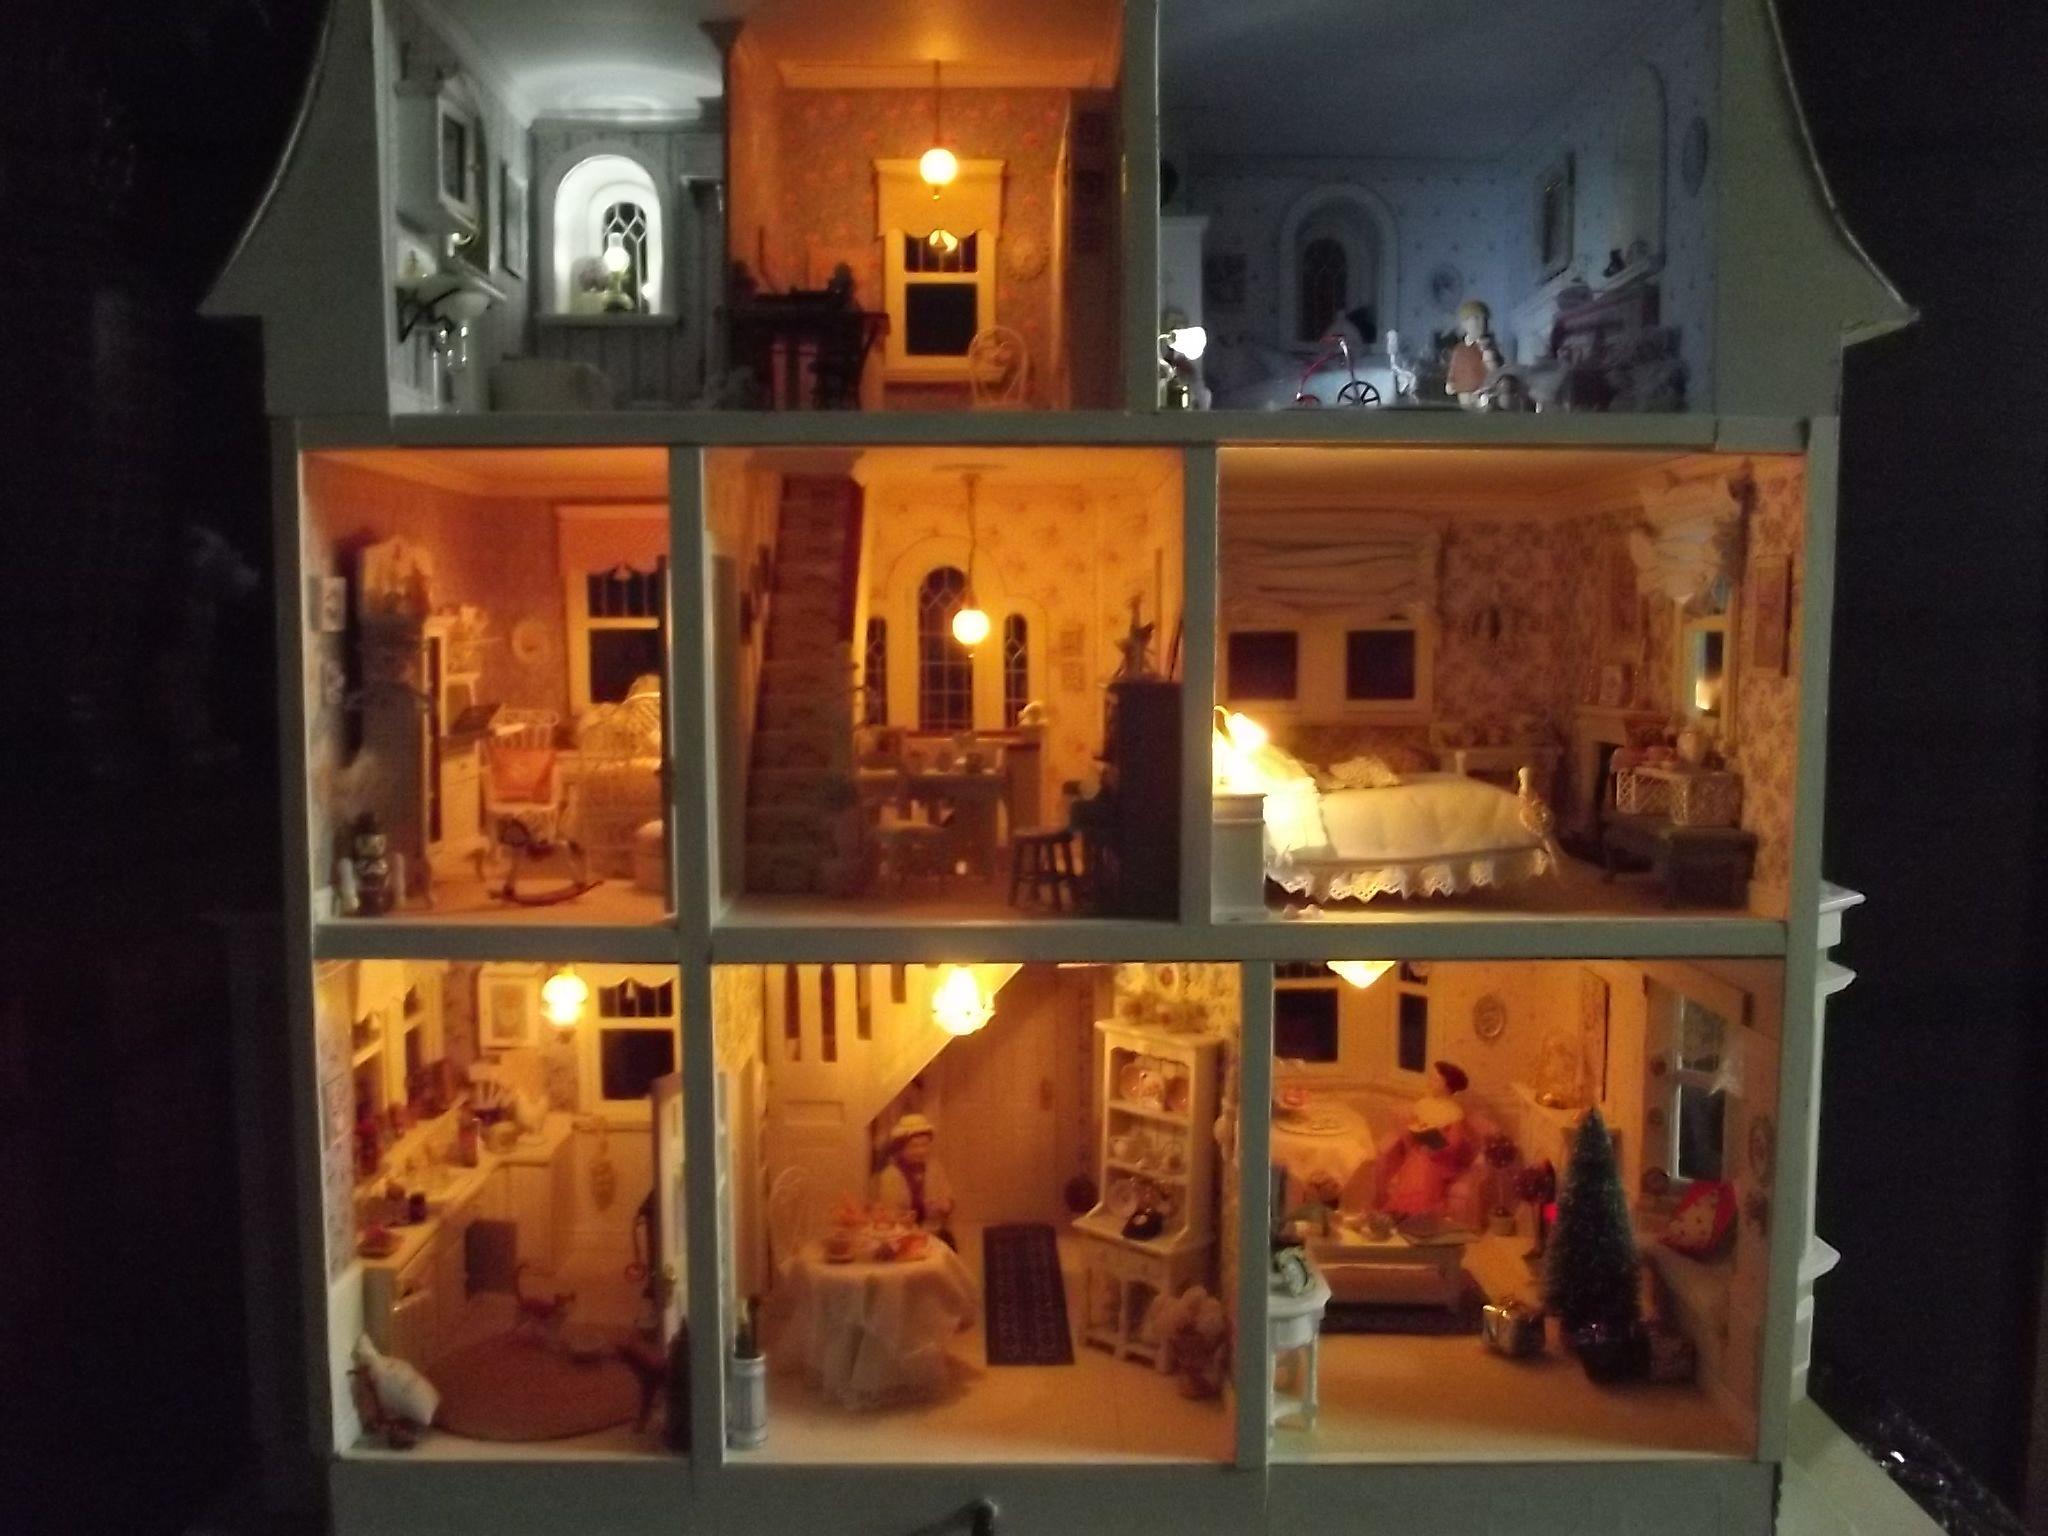 Beacon Hill Dolls House at night